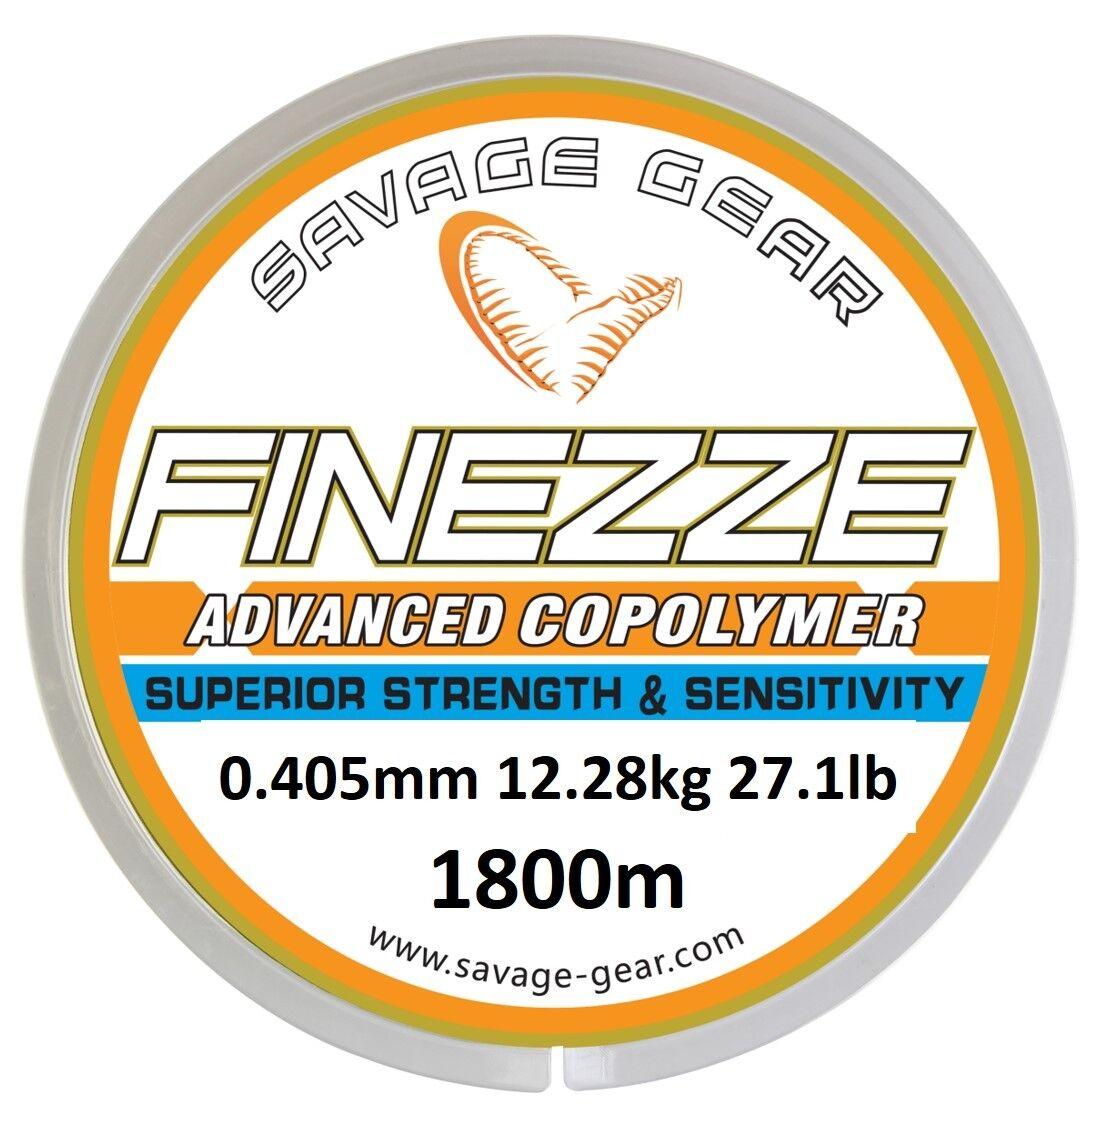 SAVAGE GEAR FINEZZE ADVANCED COPOLYMER 1800M MONO LINE BOAT BEACH SEA FISHING